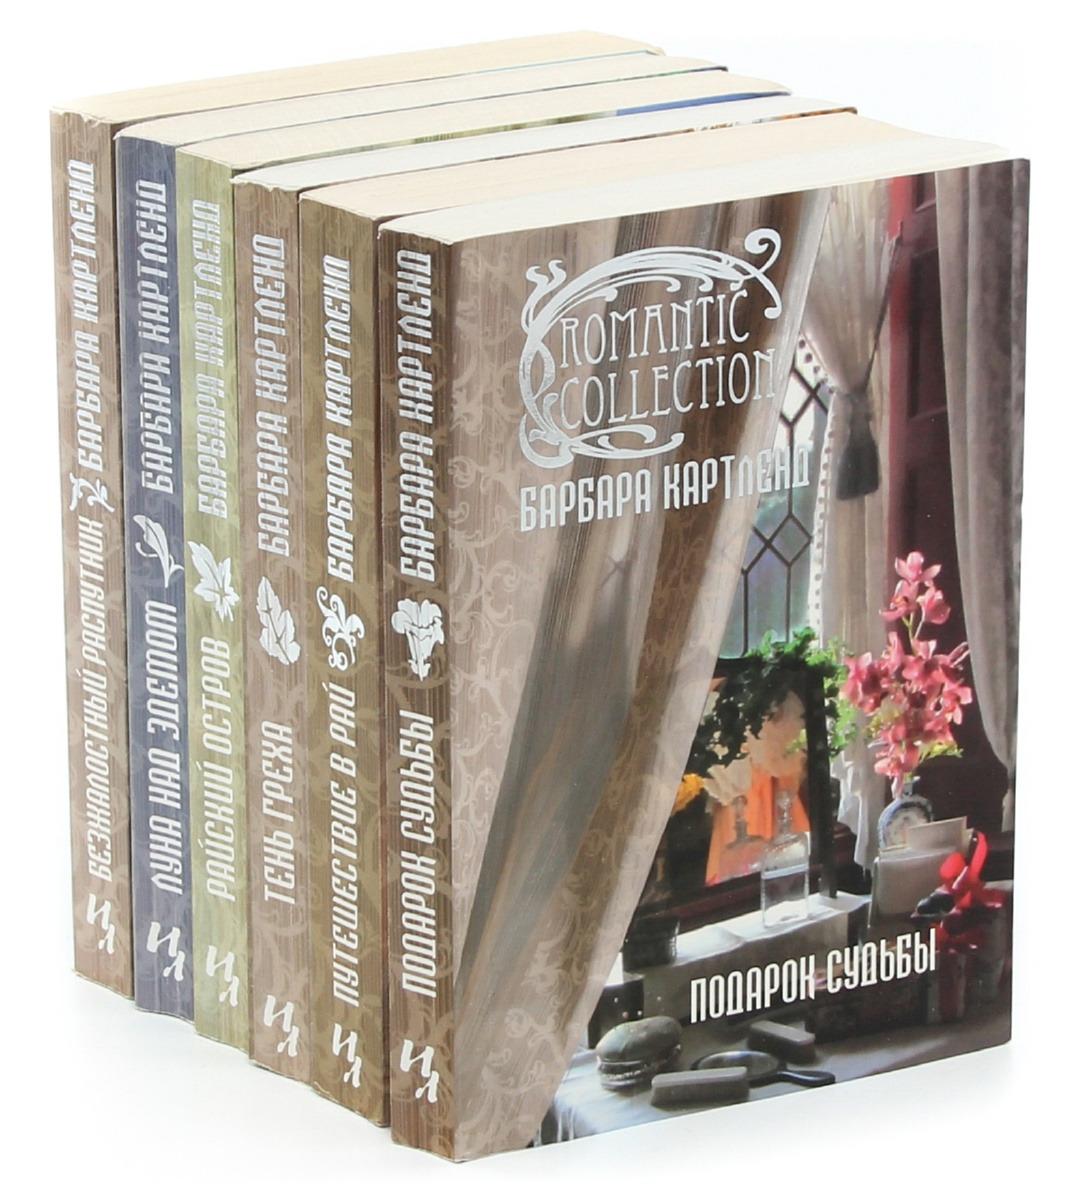 Картленд Барбара Барбара Картленд. Серия Romantic Collection (комплект из 6 книг) картленд барбара бегство от страсти